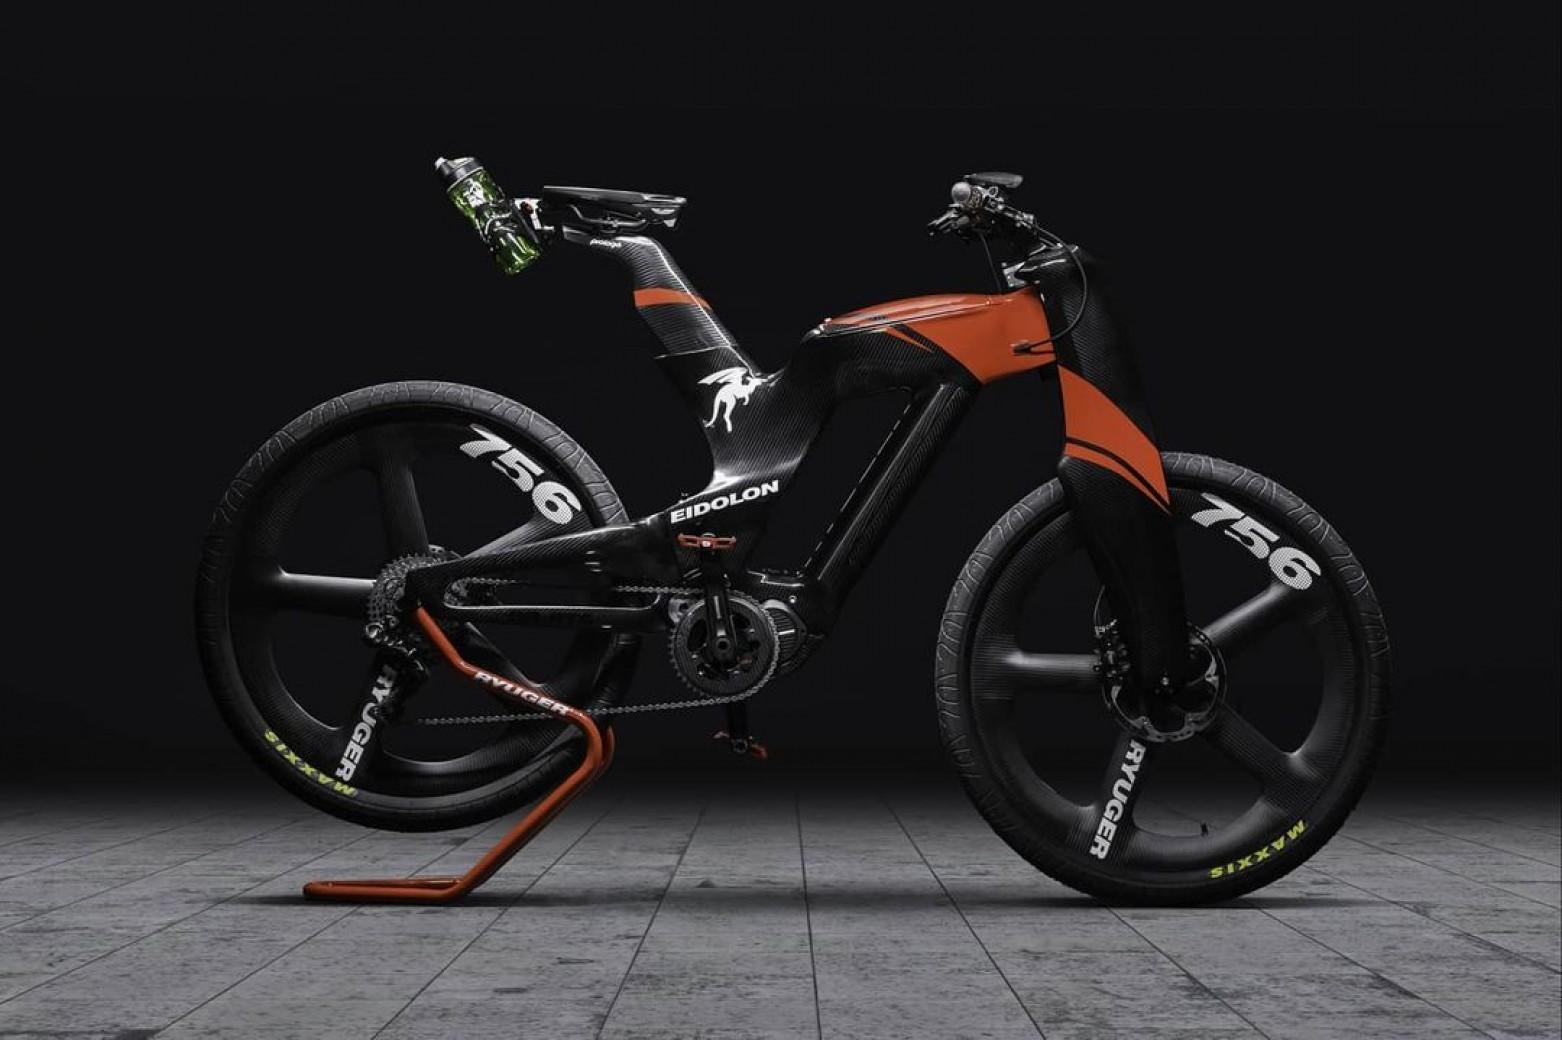 ryuger-eidolon-ebike-aerodinamica/